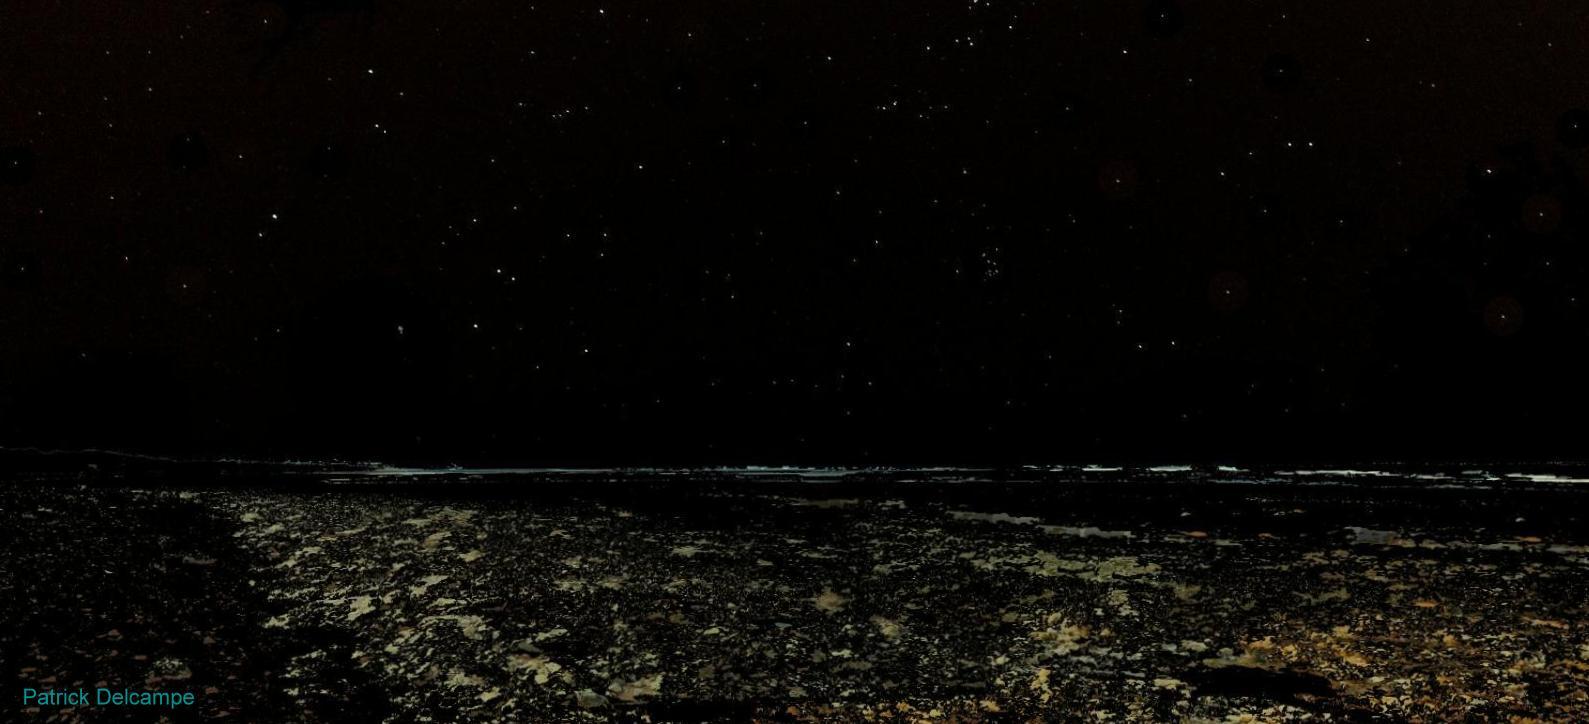 Les Sables Vigner pano 15 mer étoilée.jpg